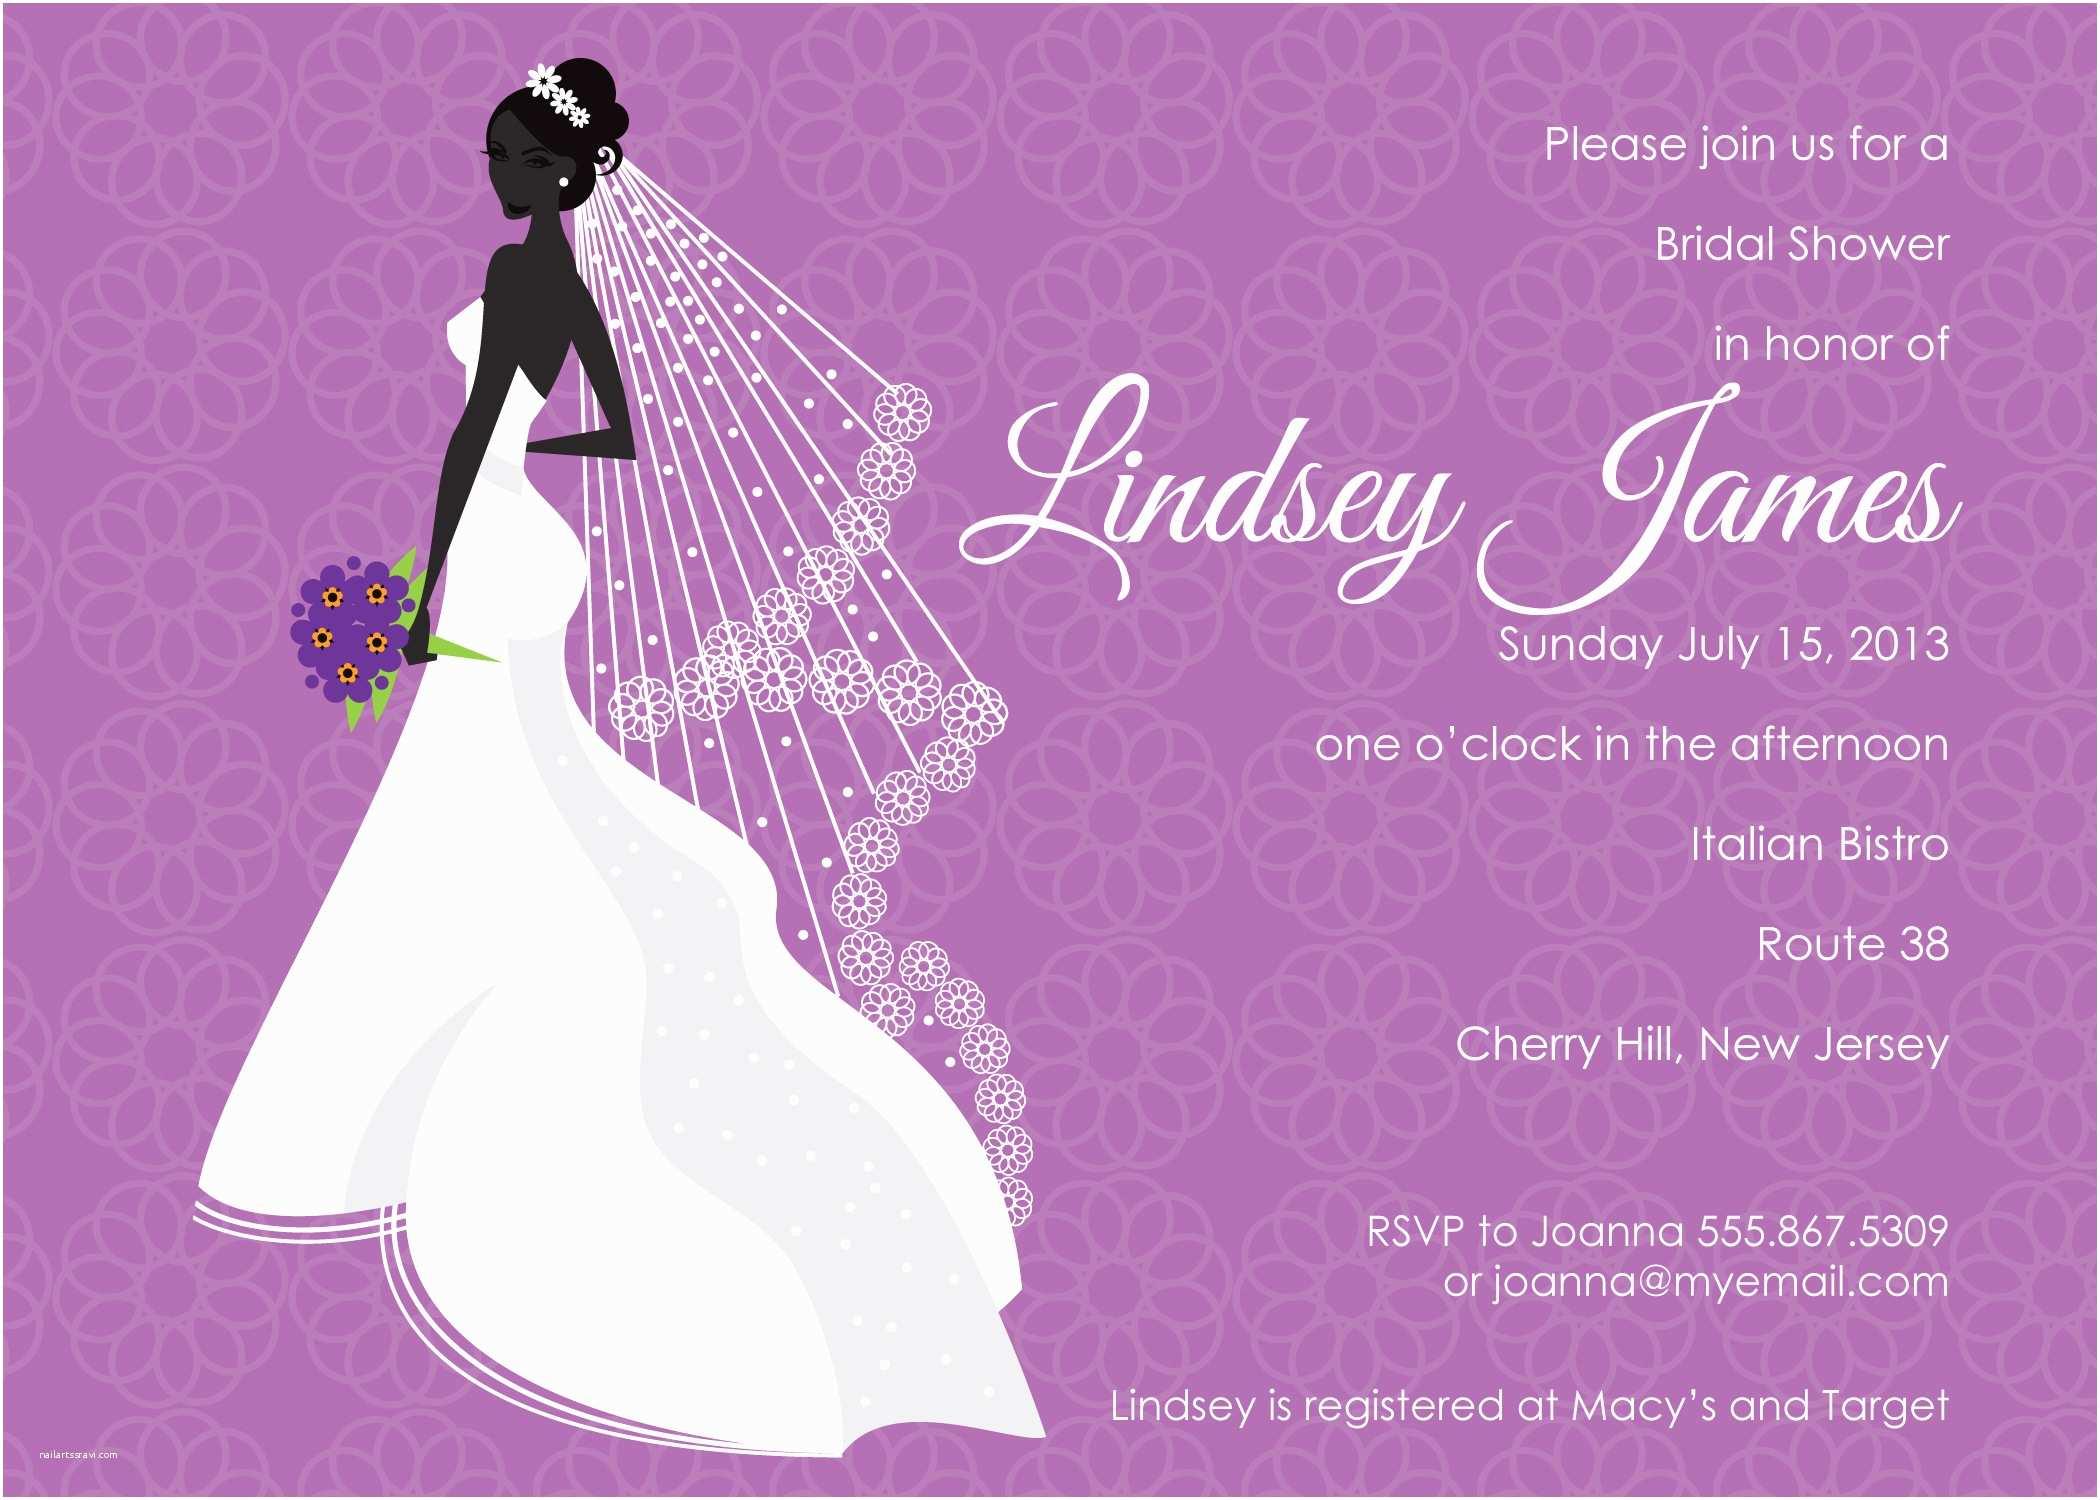 Party City Bridal Shower Invitations Wedding Invitations Party City Party City Bridal Shower